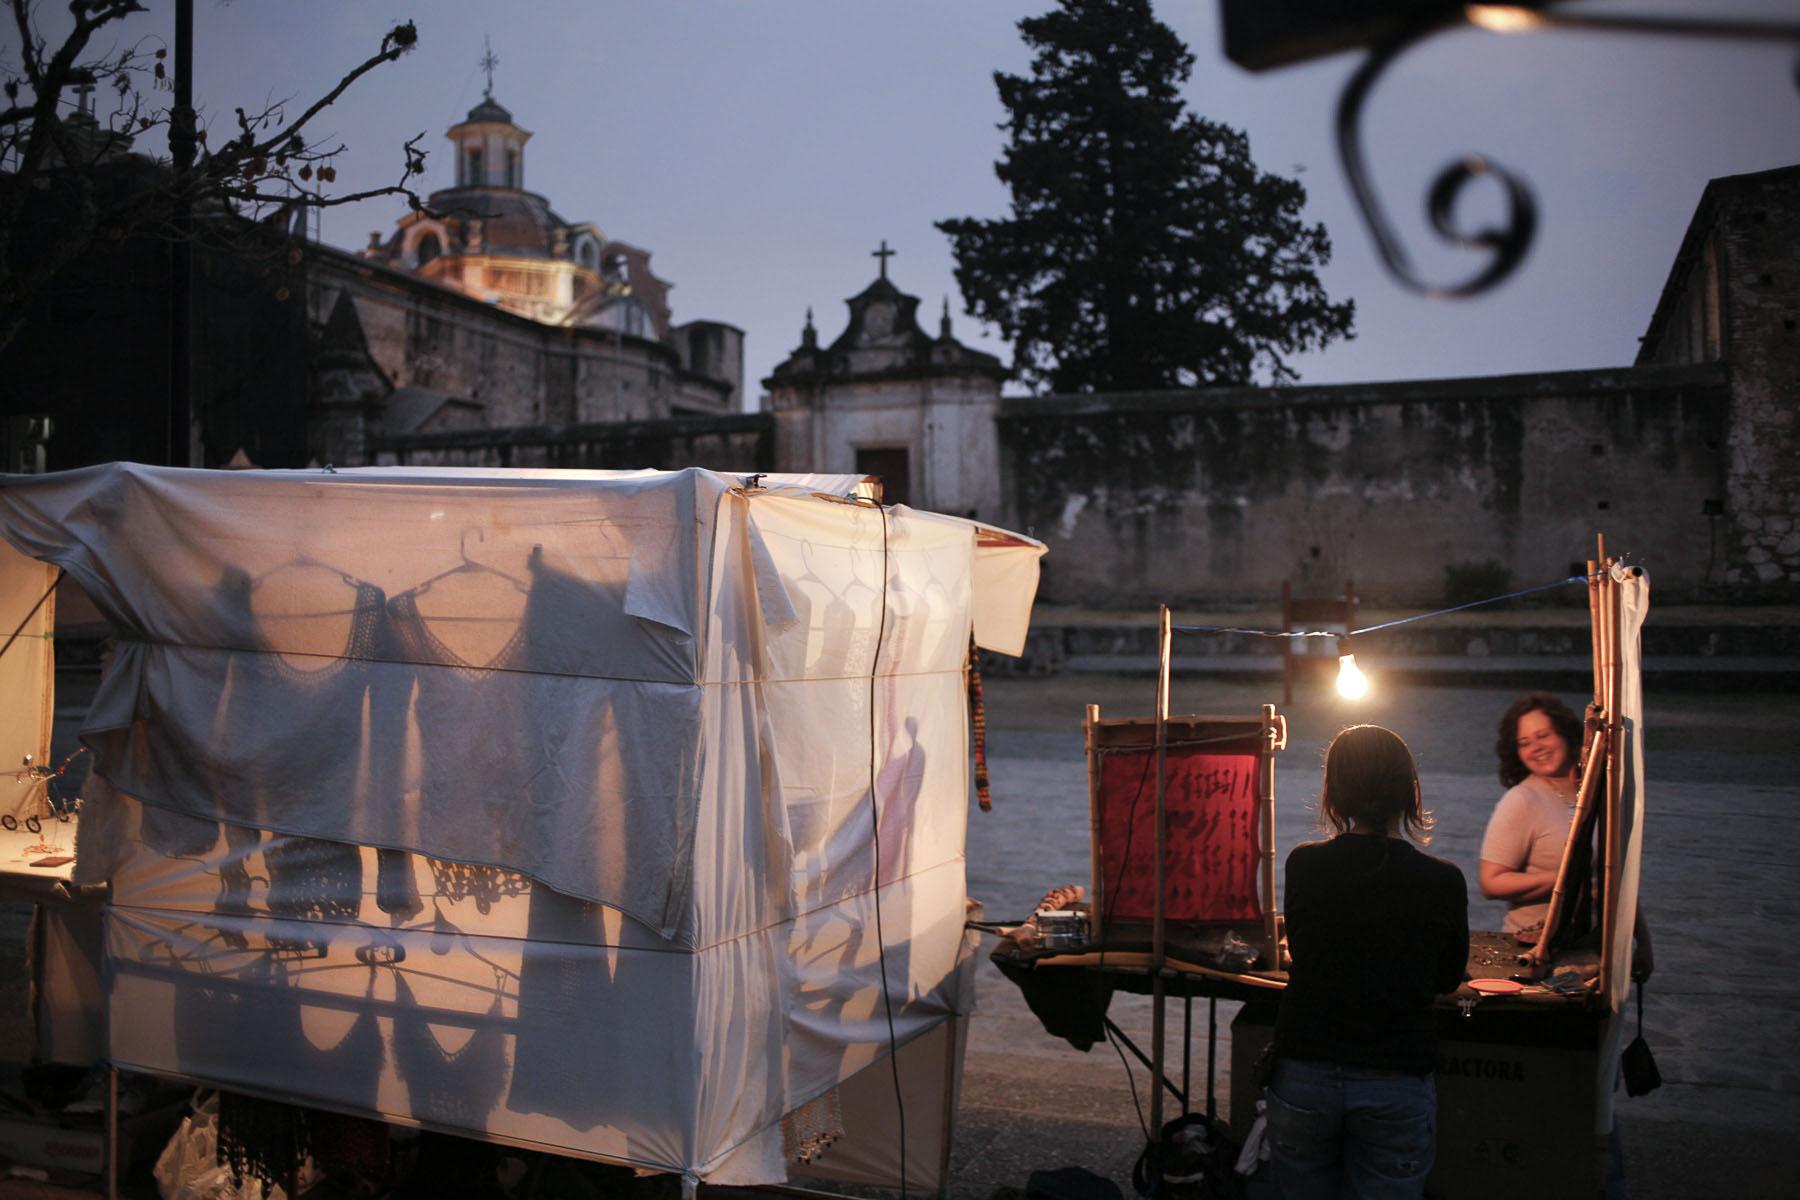 Alta Gracia, the town where Ernesto «Che» Guevara de la Serna spent his youth in September 2007